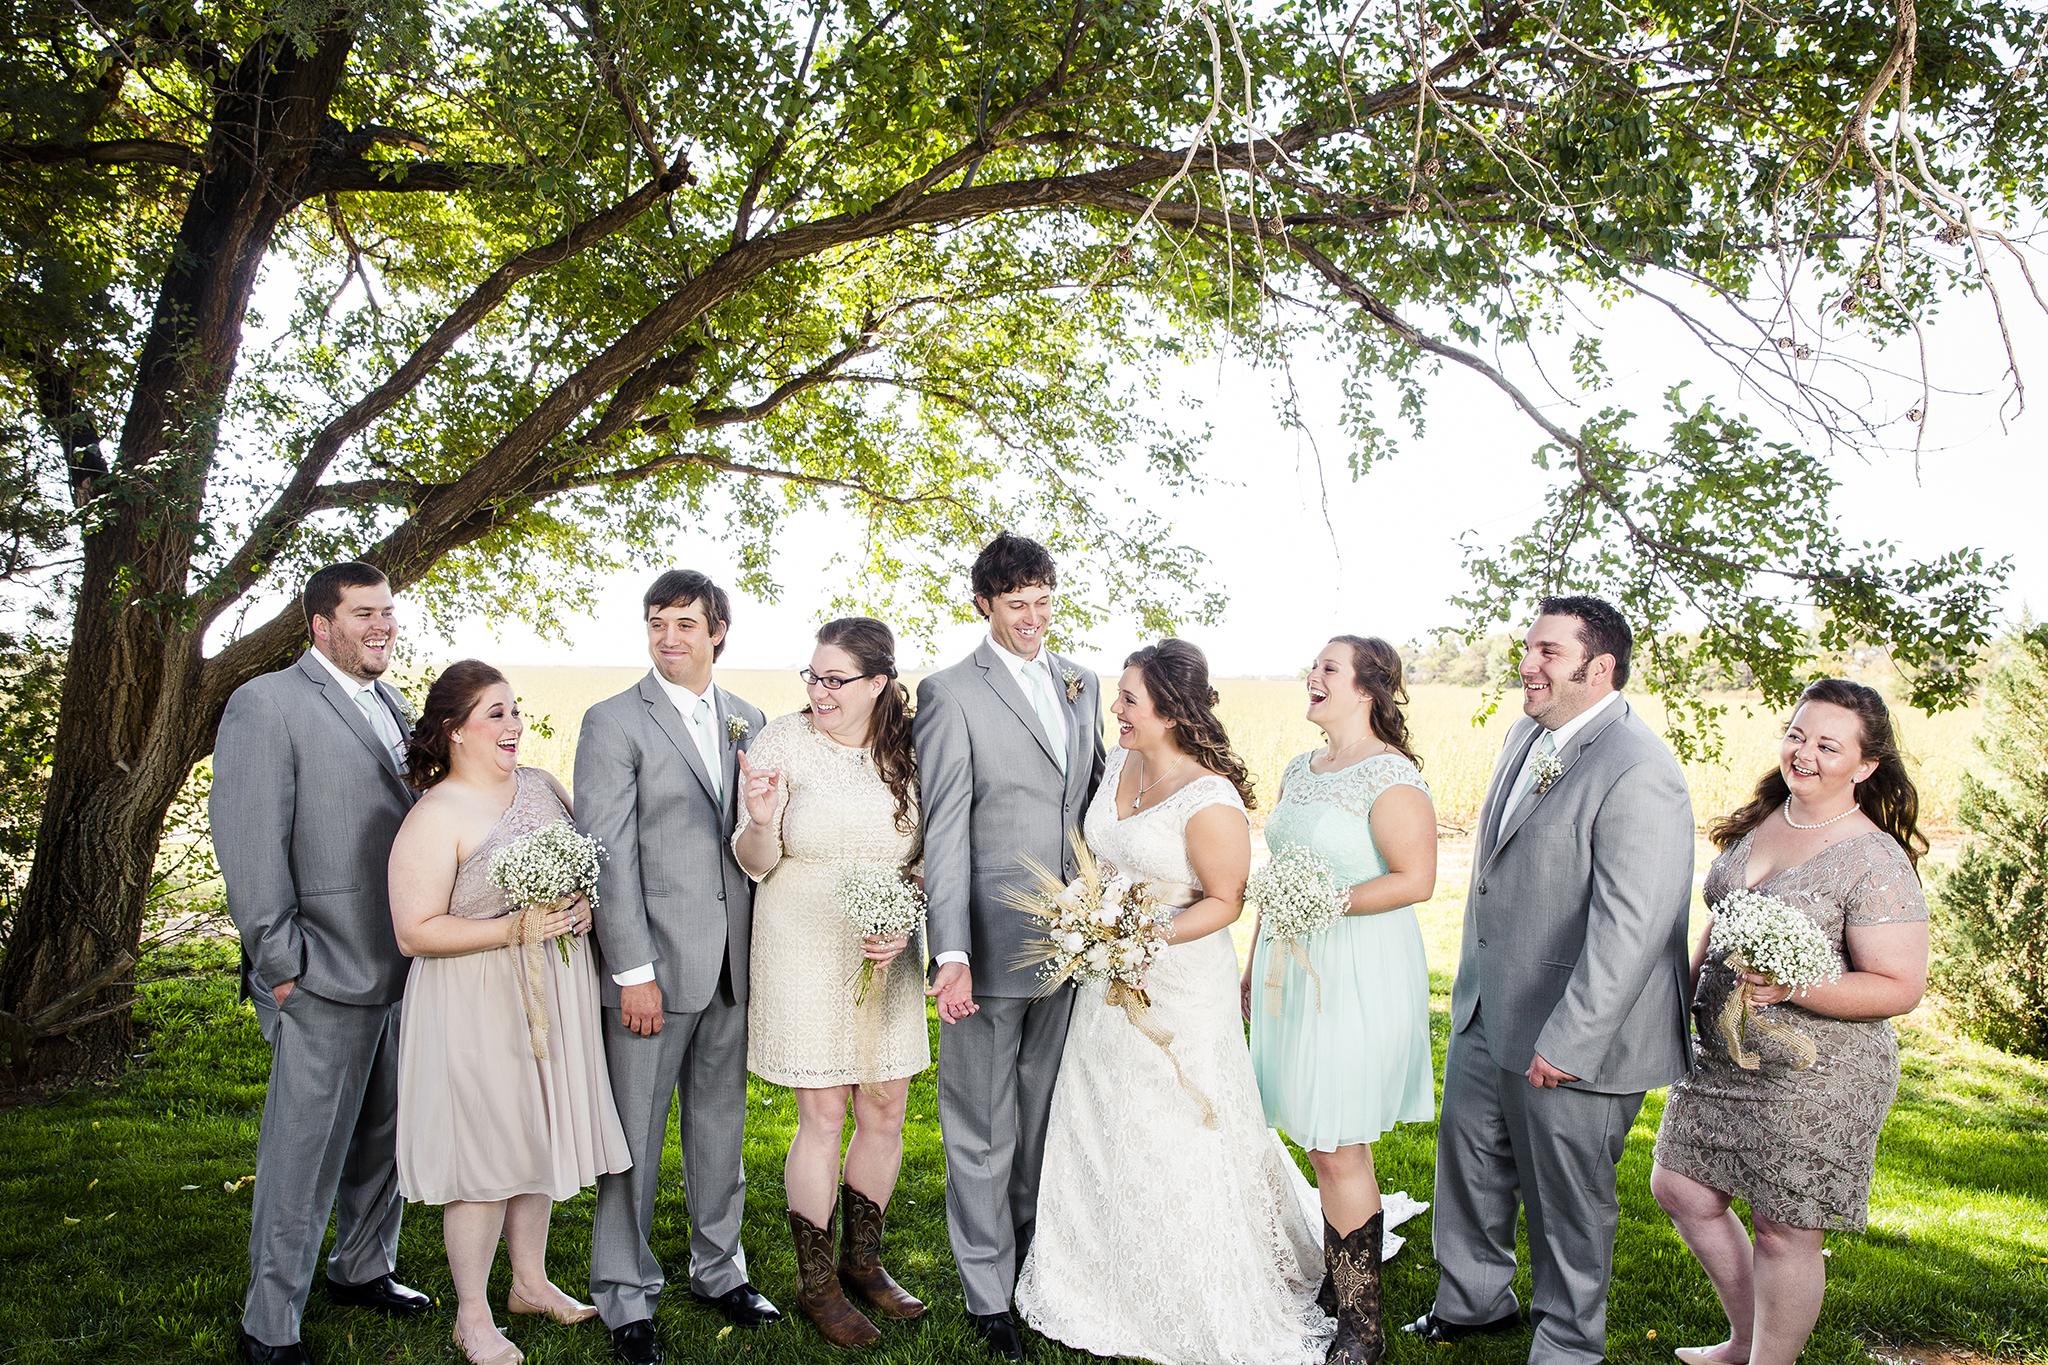 Lubbock Wedding Photography Wedding Photographer Walnut Tree Bridal Party